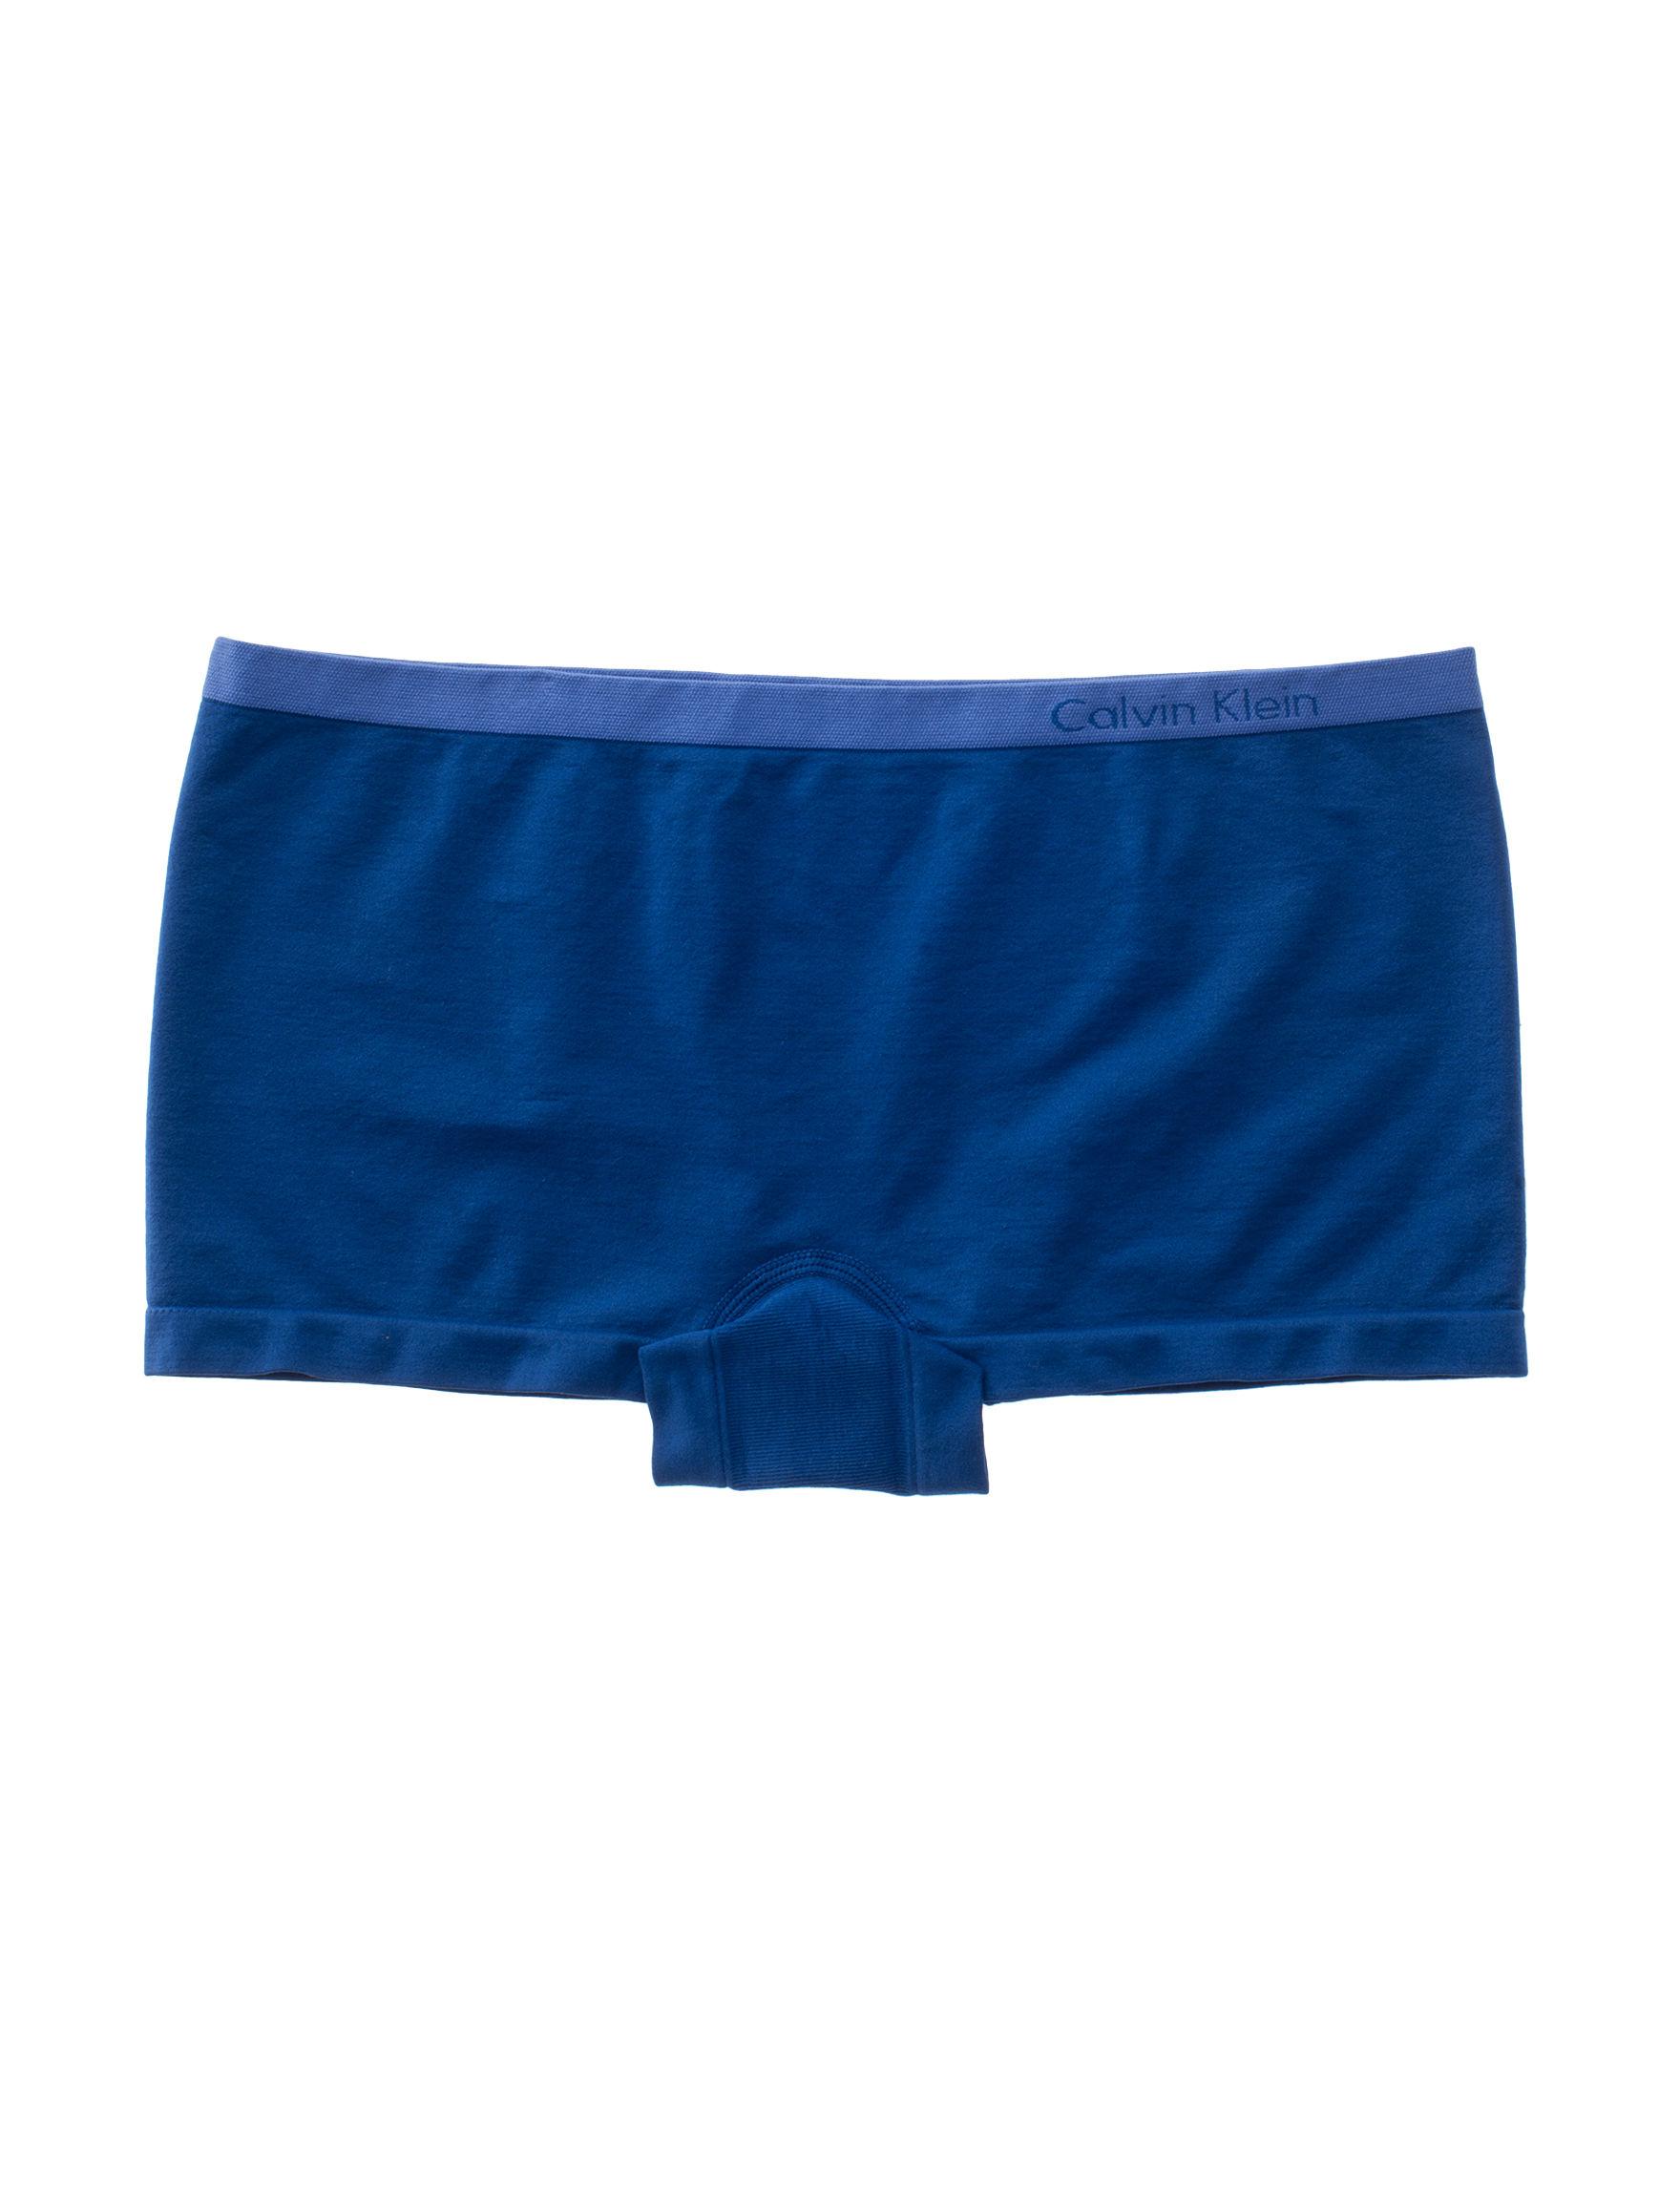 Calvin Klein Blue Panties